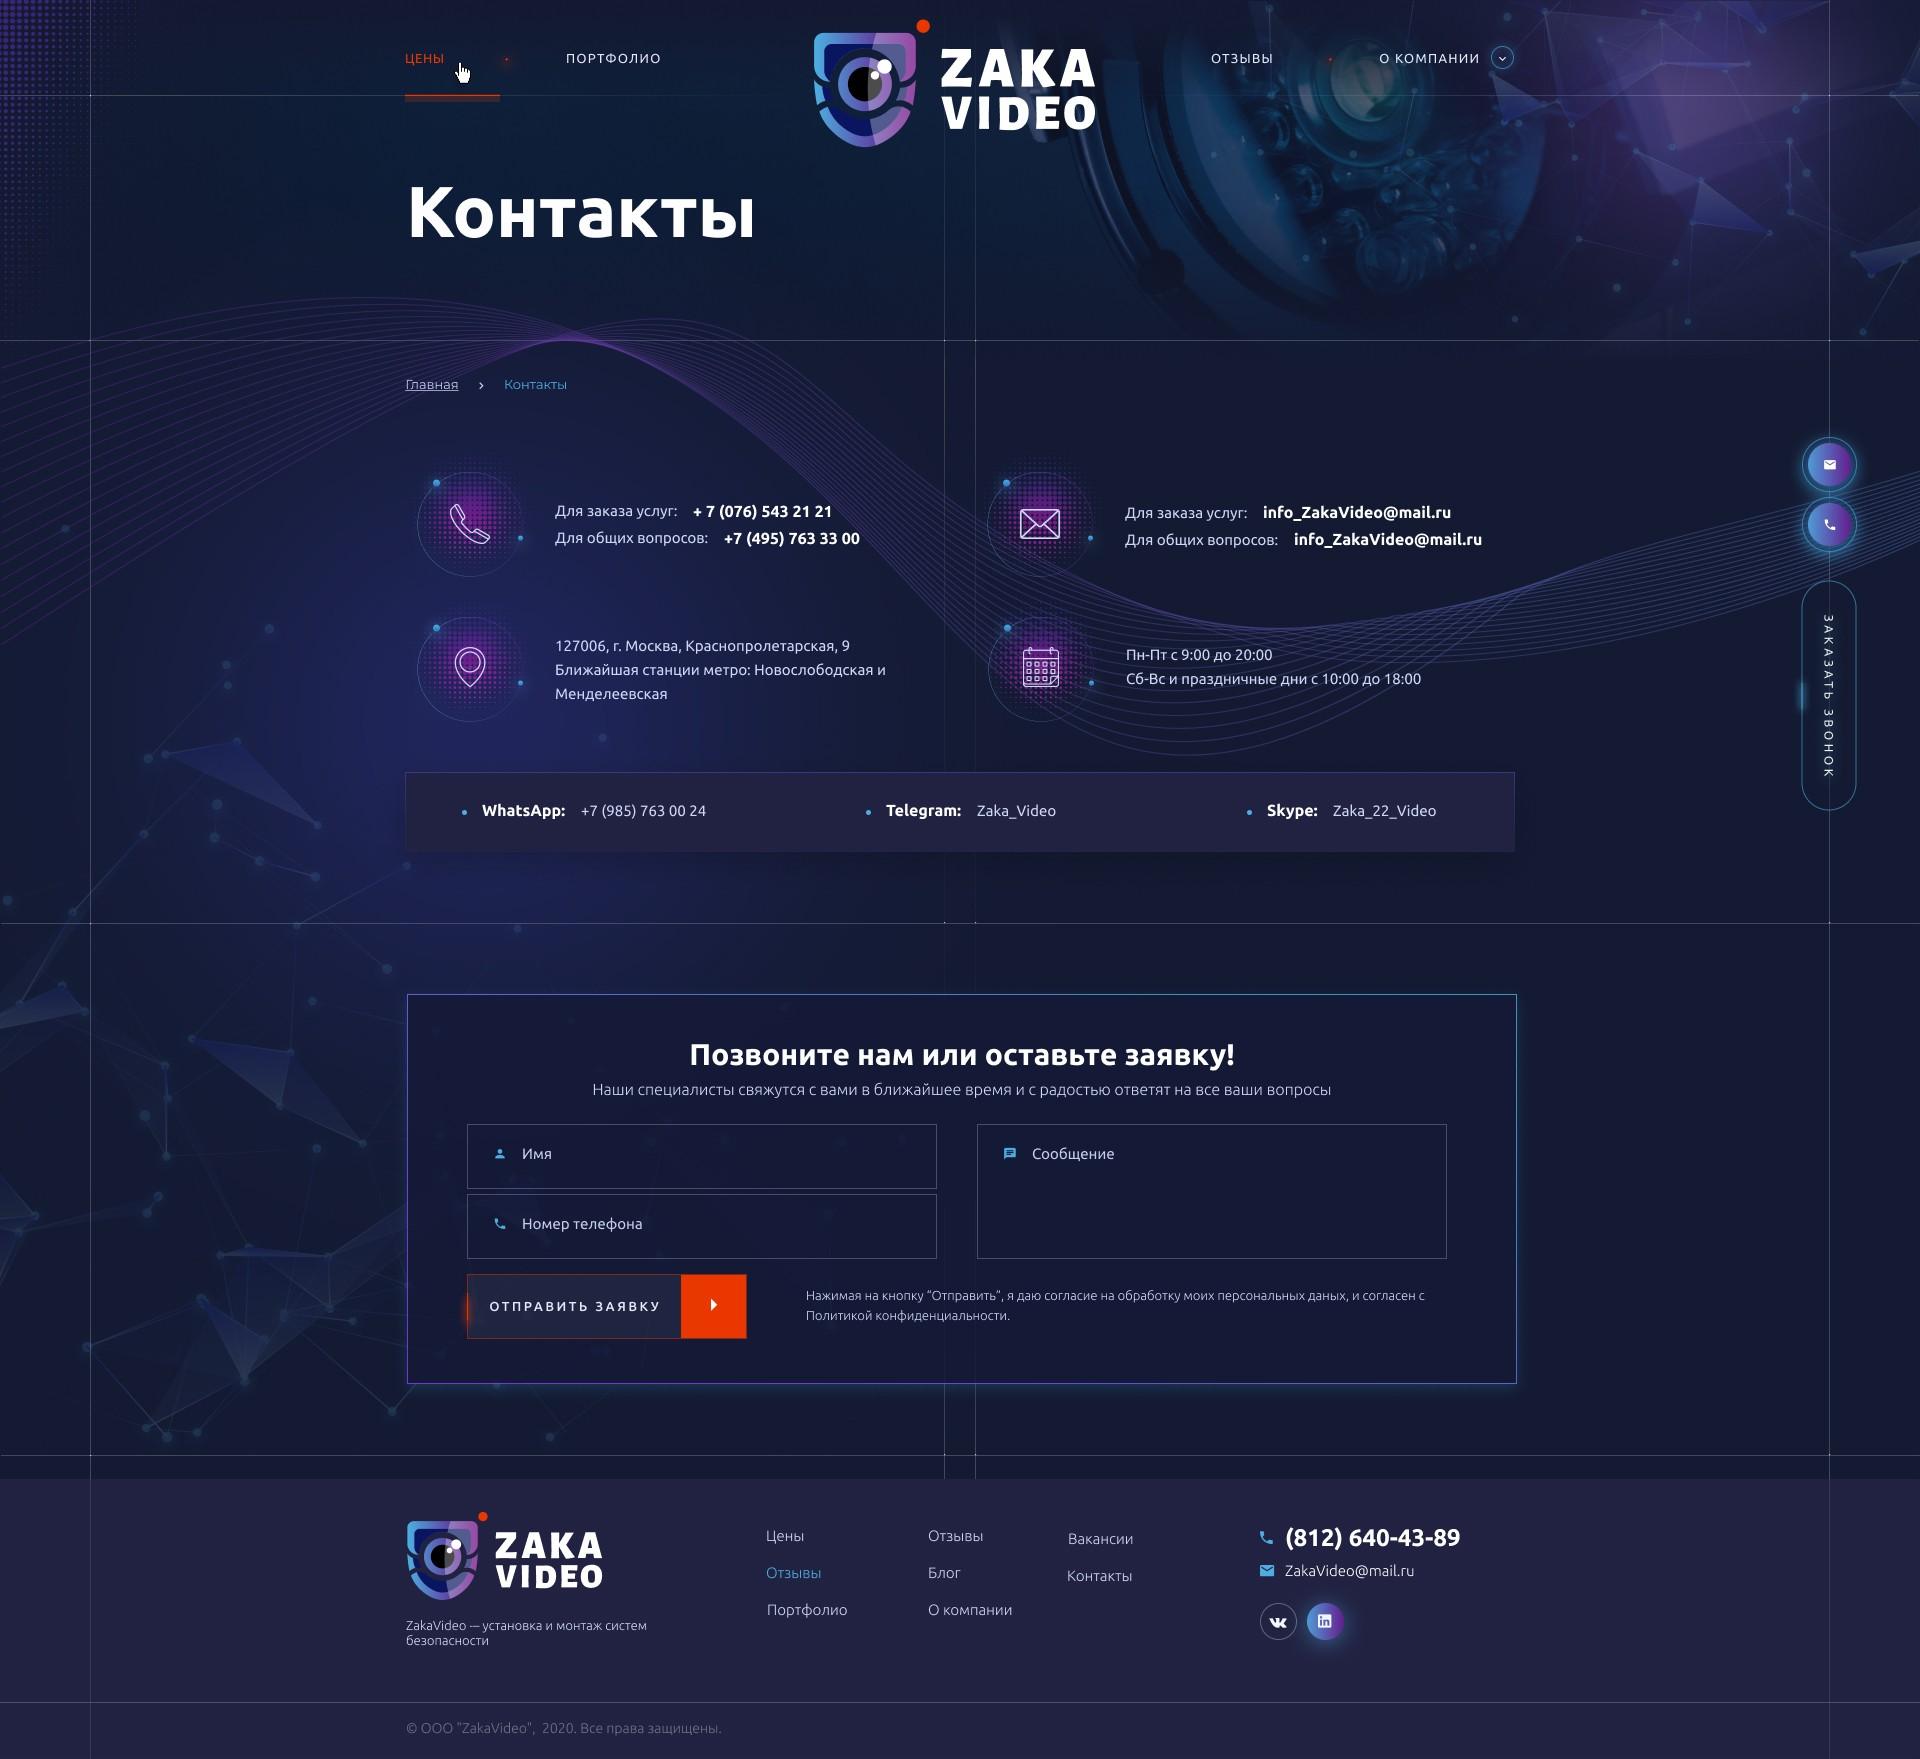 12_ZakaVideoi_Contacts_0.1